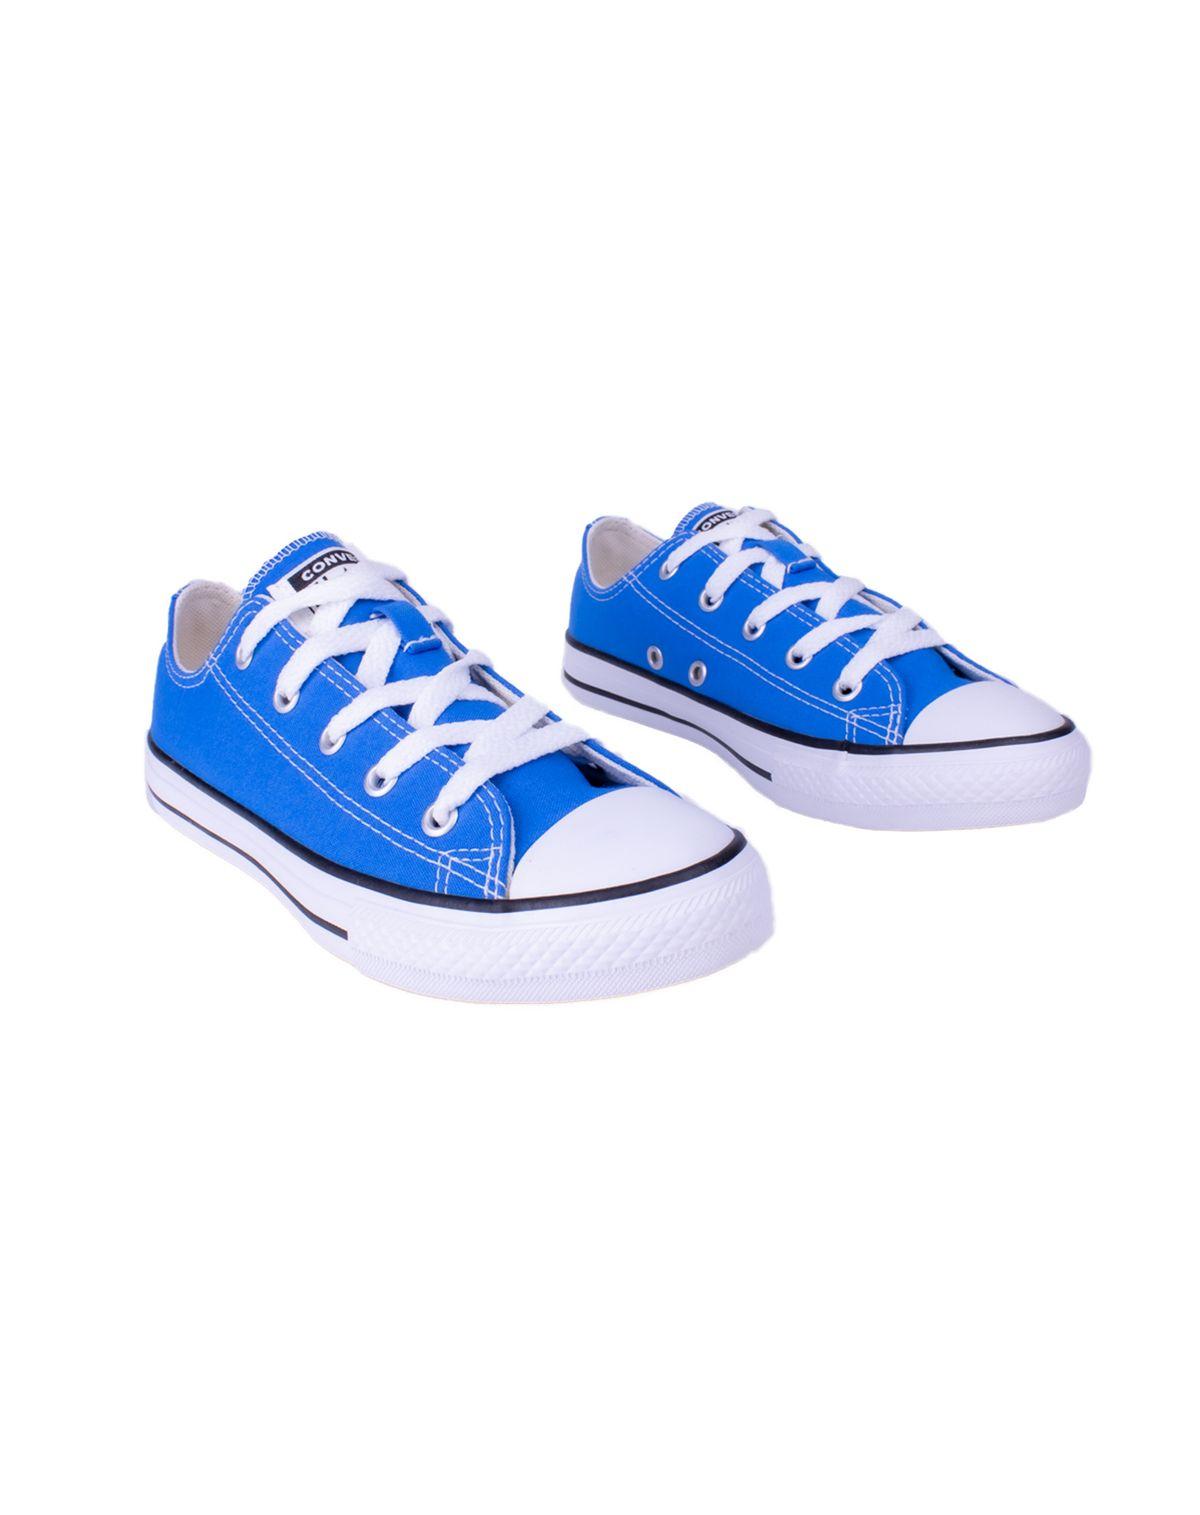 588091019-tenis-infantil-unissex-converse-chuck-taylor-all-star-azul-28-57a